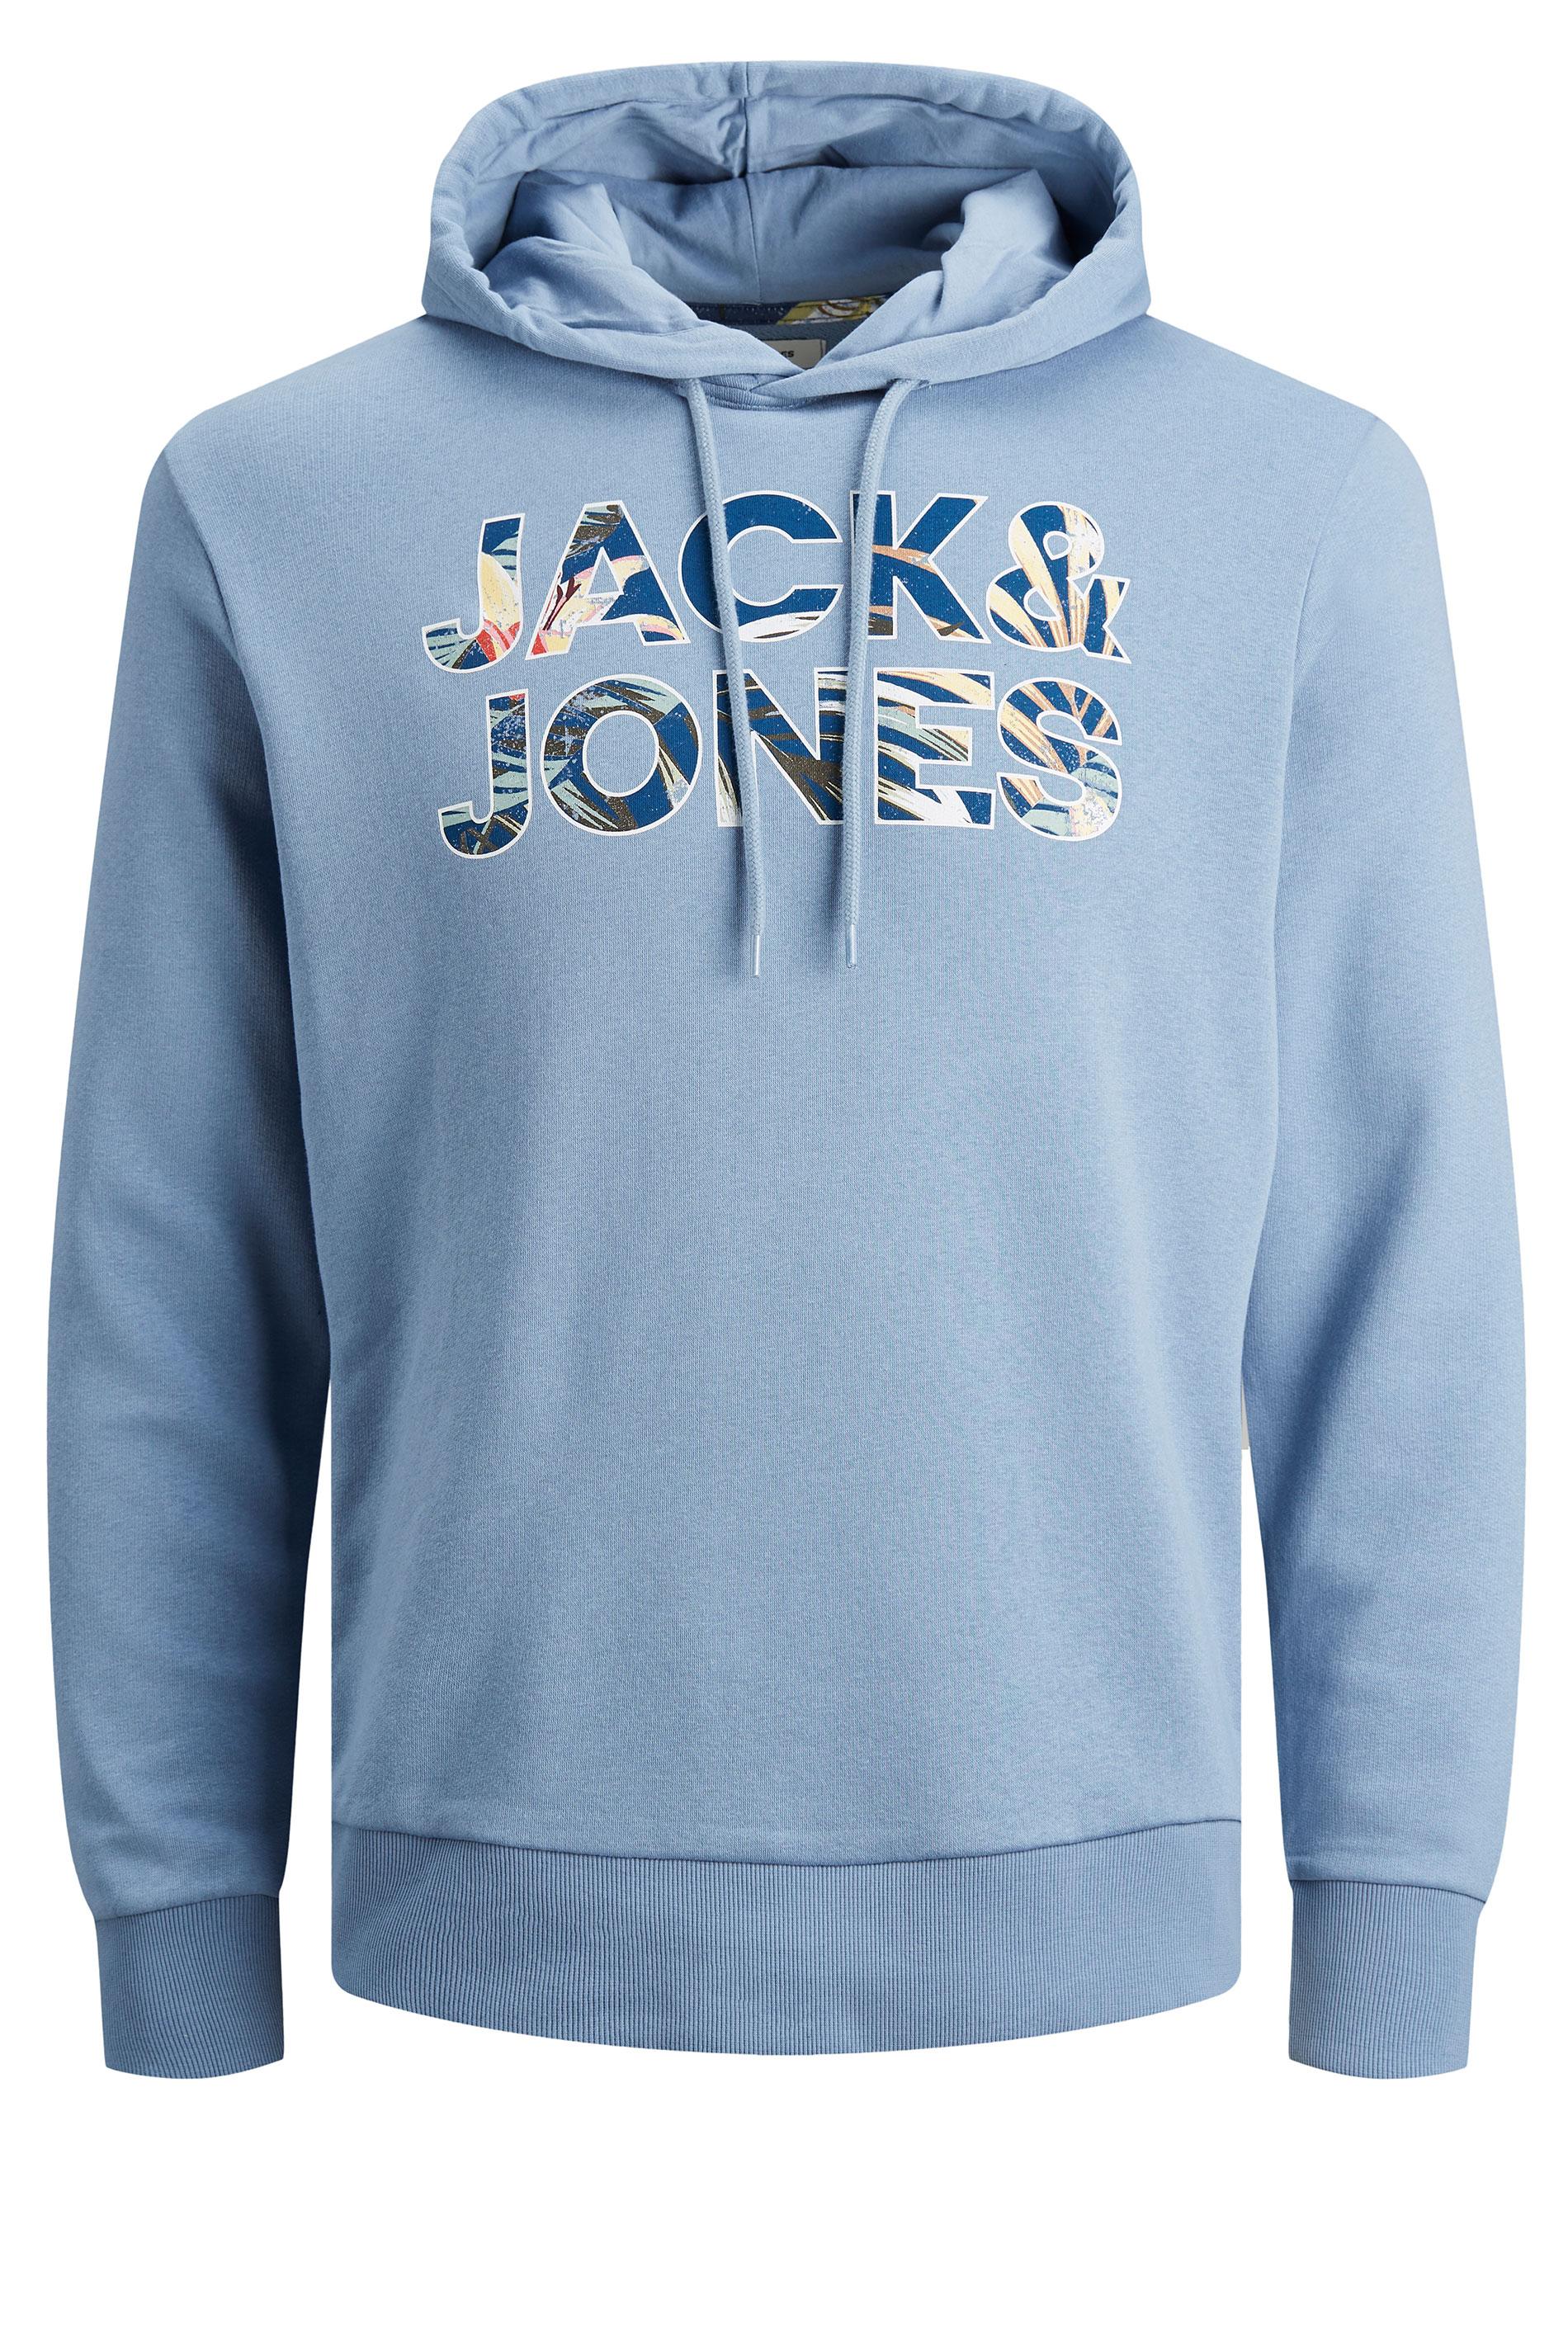 JACK & JONES Light Blue Navy Fleur Hoodie